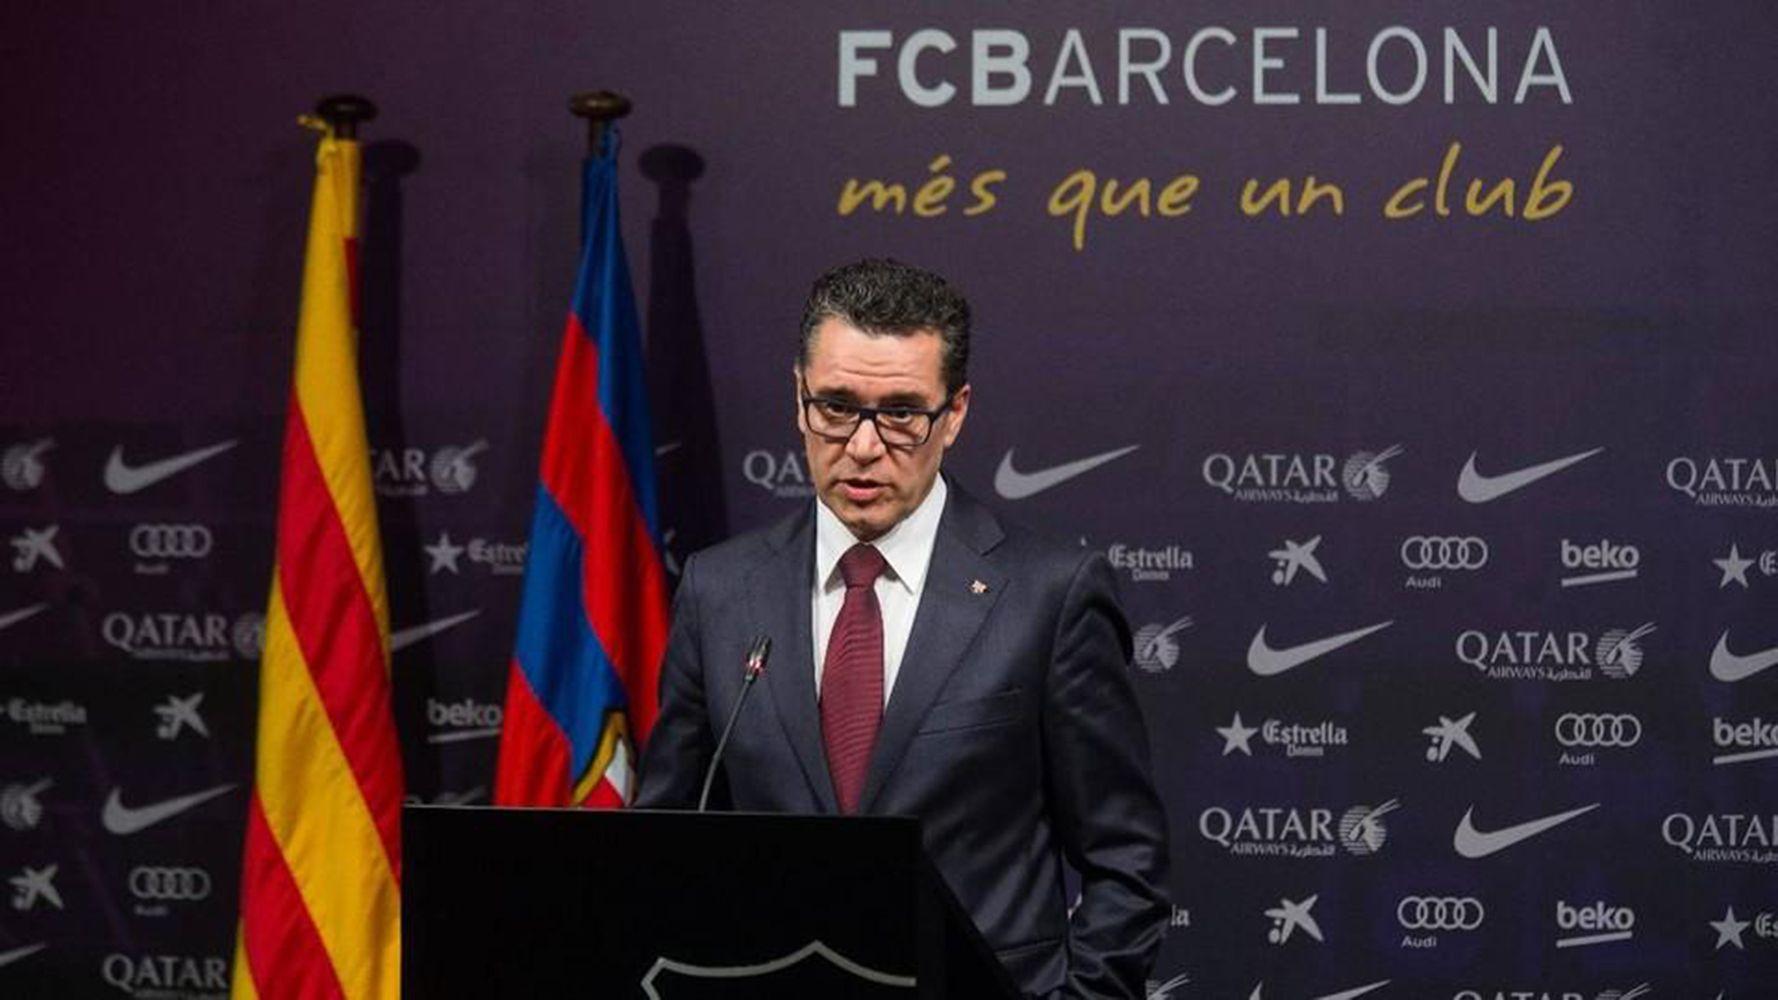 Josep Vives Barça   FC Barcelona